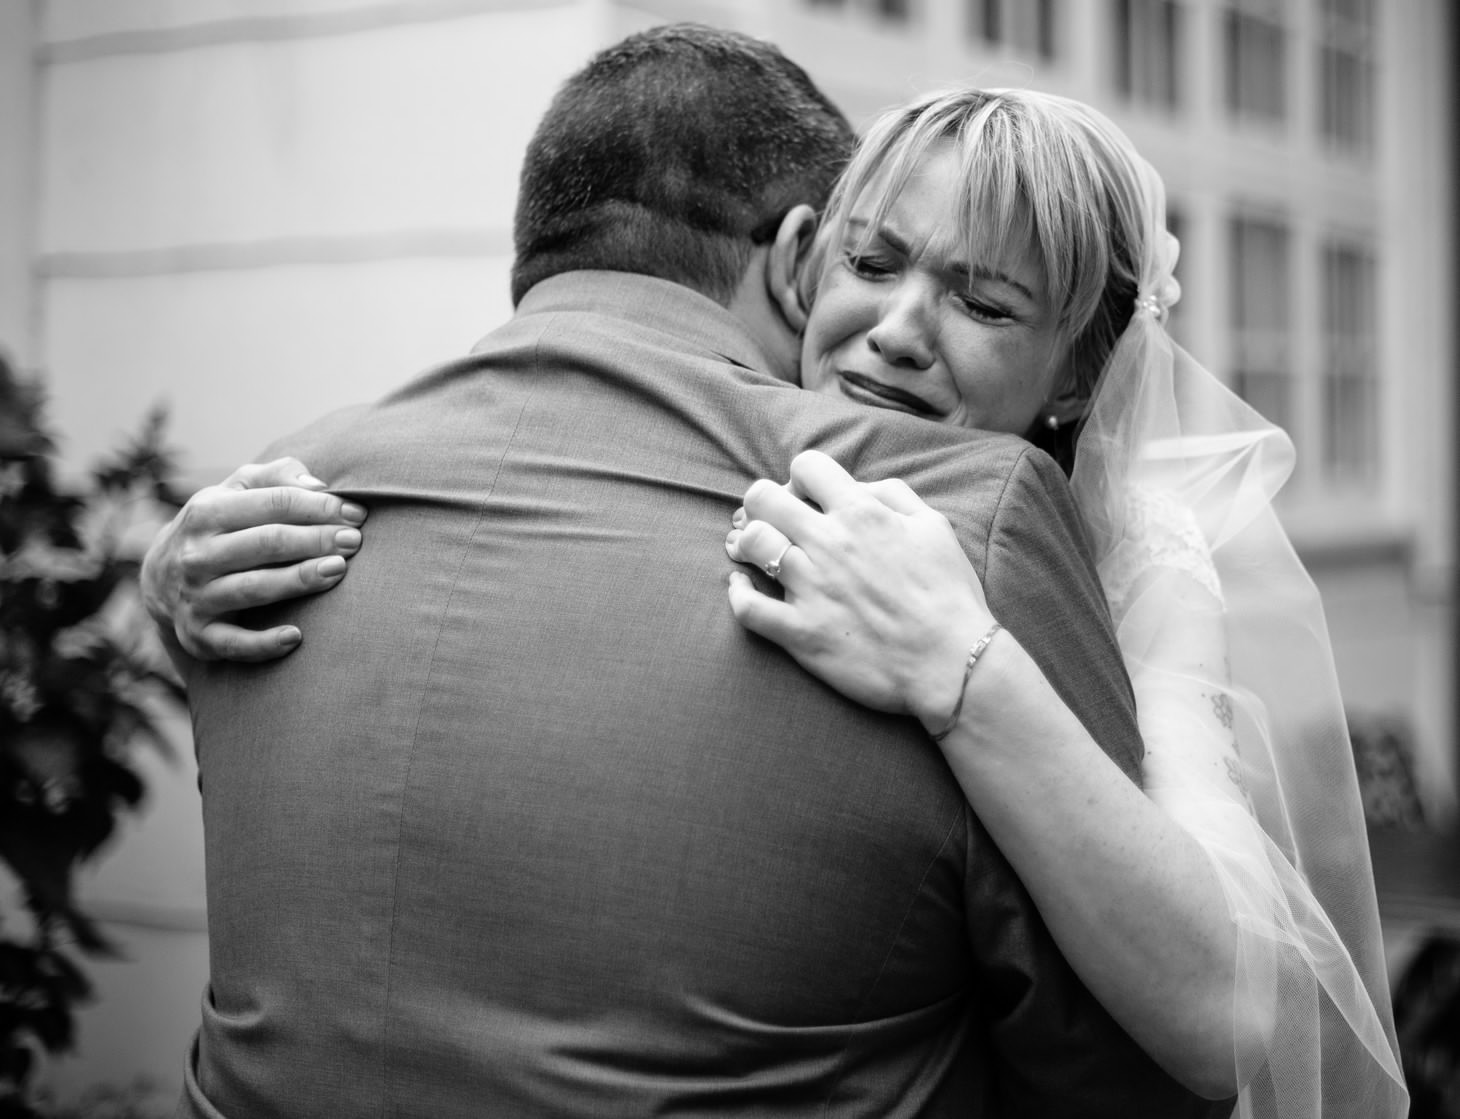 nyc-long-island-wedding-photographer-three-village-inn-smitten-chickens14.jpg